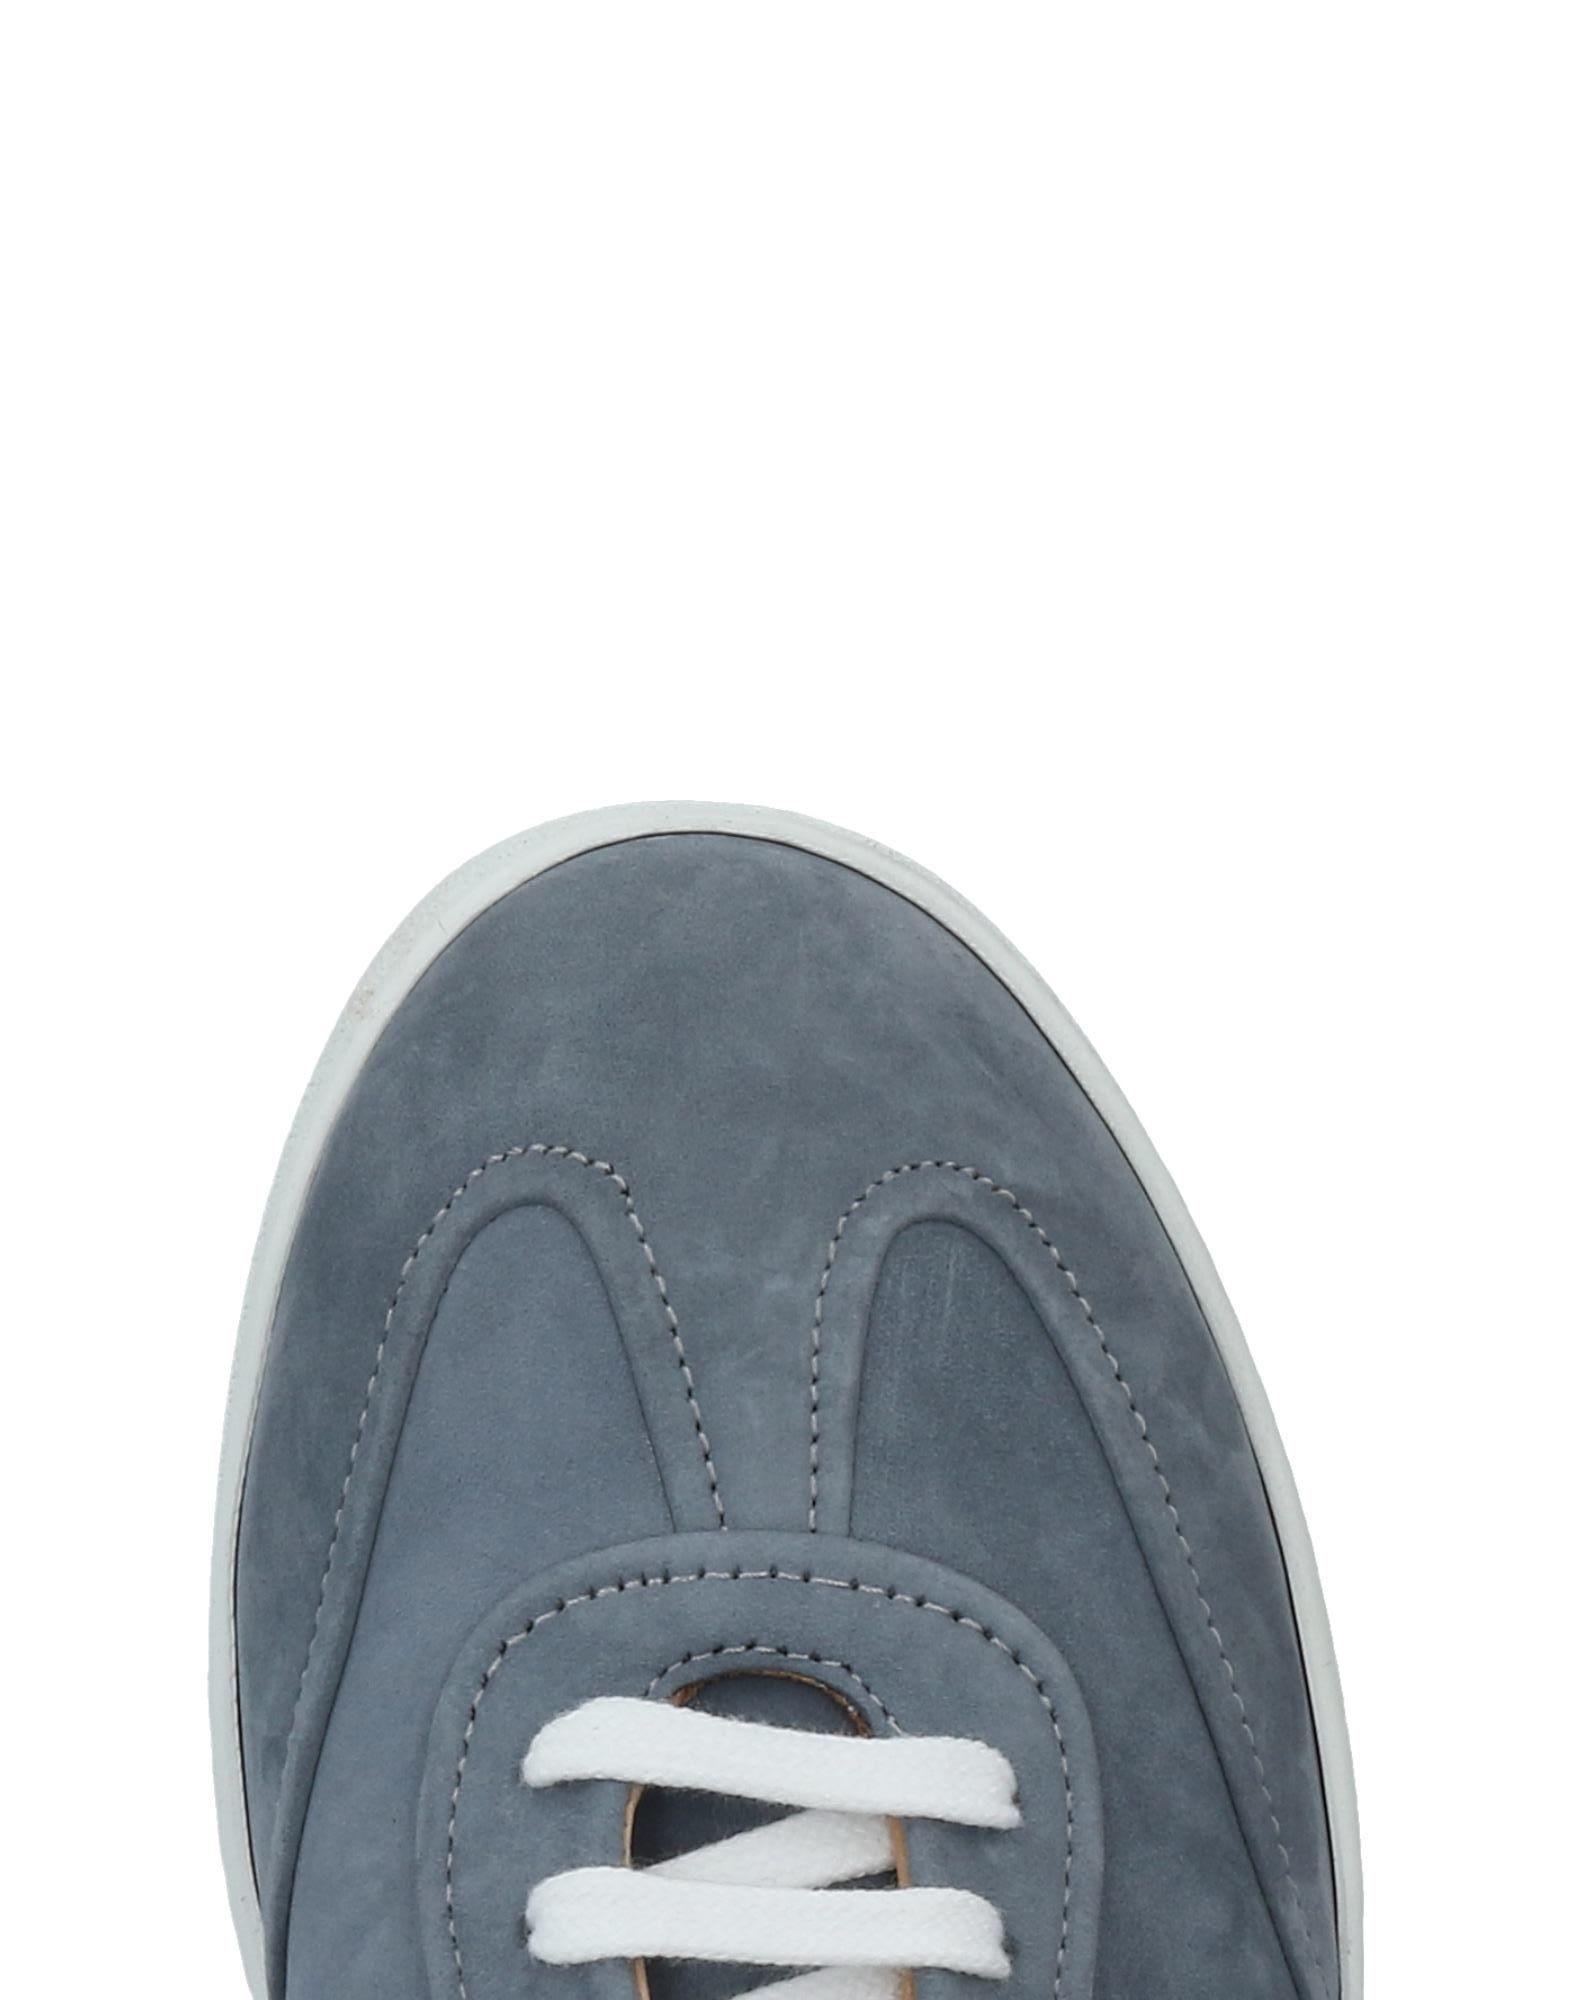 Pantofola D'oro Sneakers Herren  11455748VM Gute Qualität beliebte Schuhe